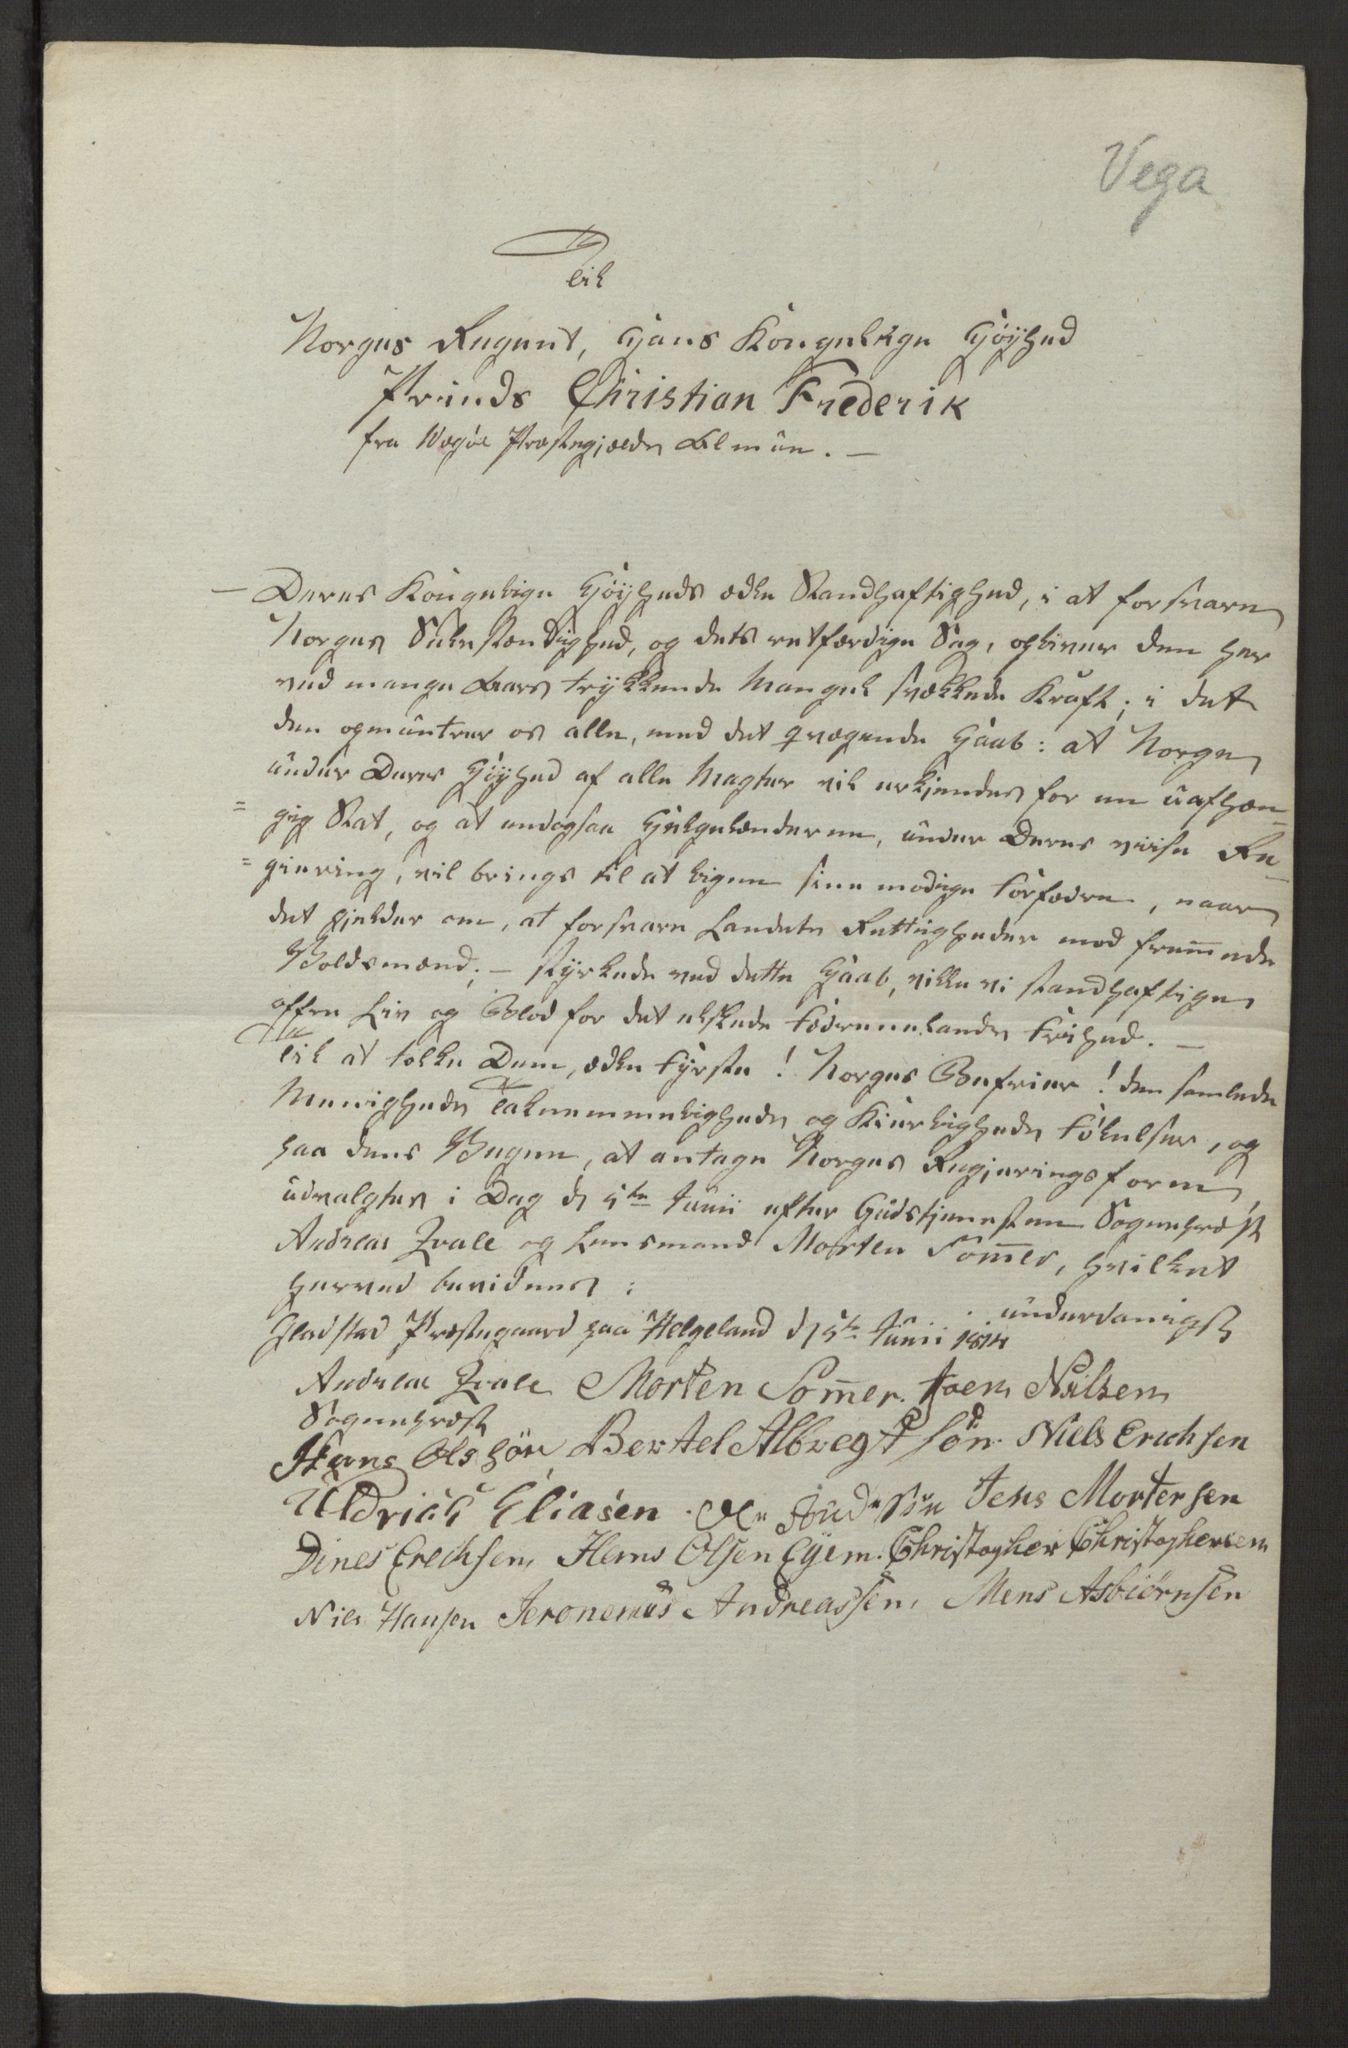 SAT, Nordland amt/fylke*, 1814, s. 46